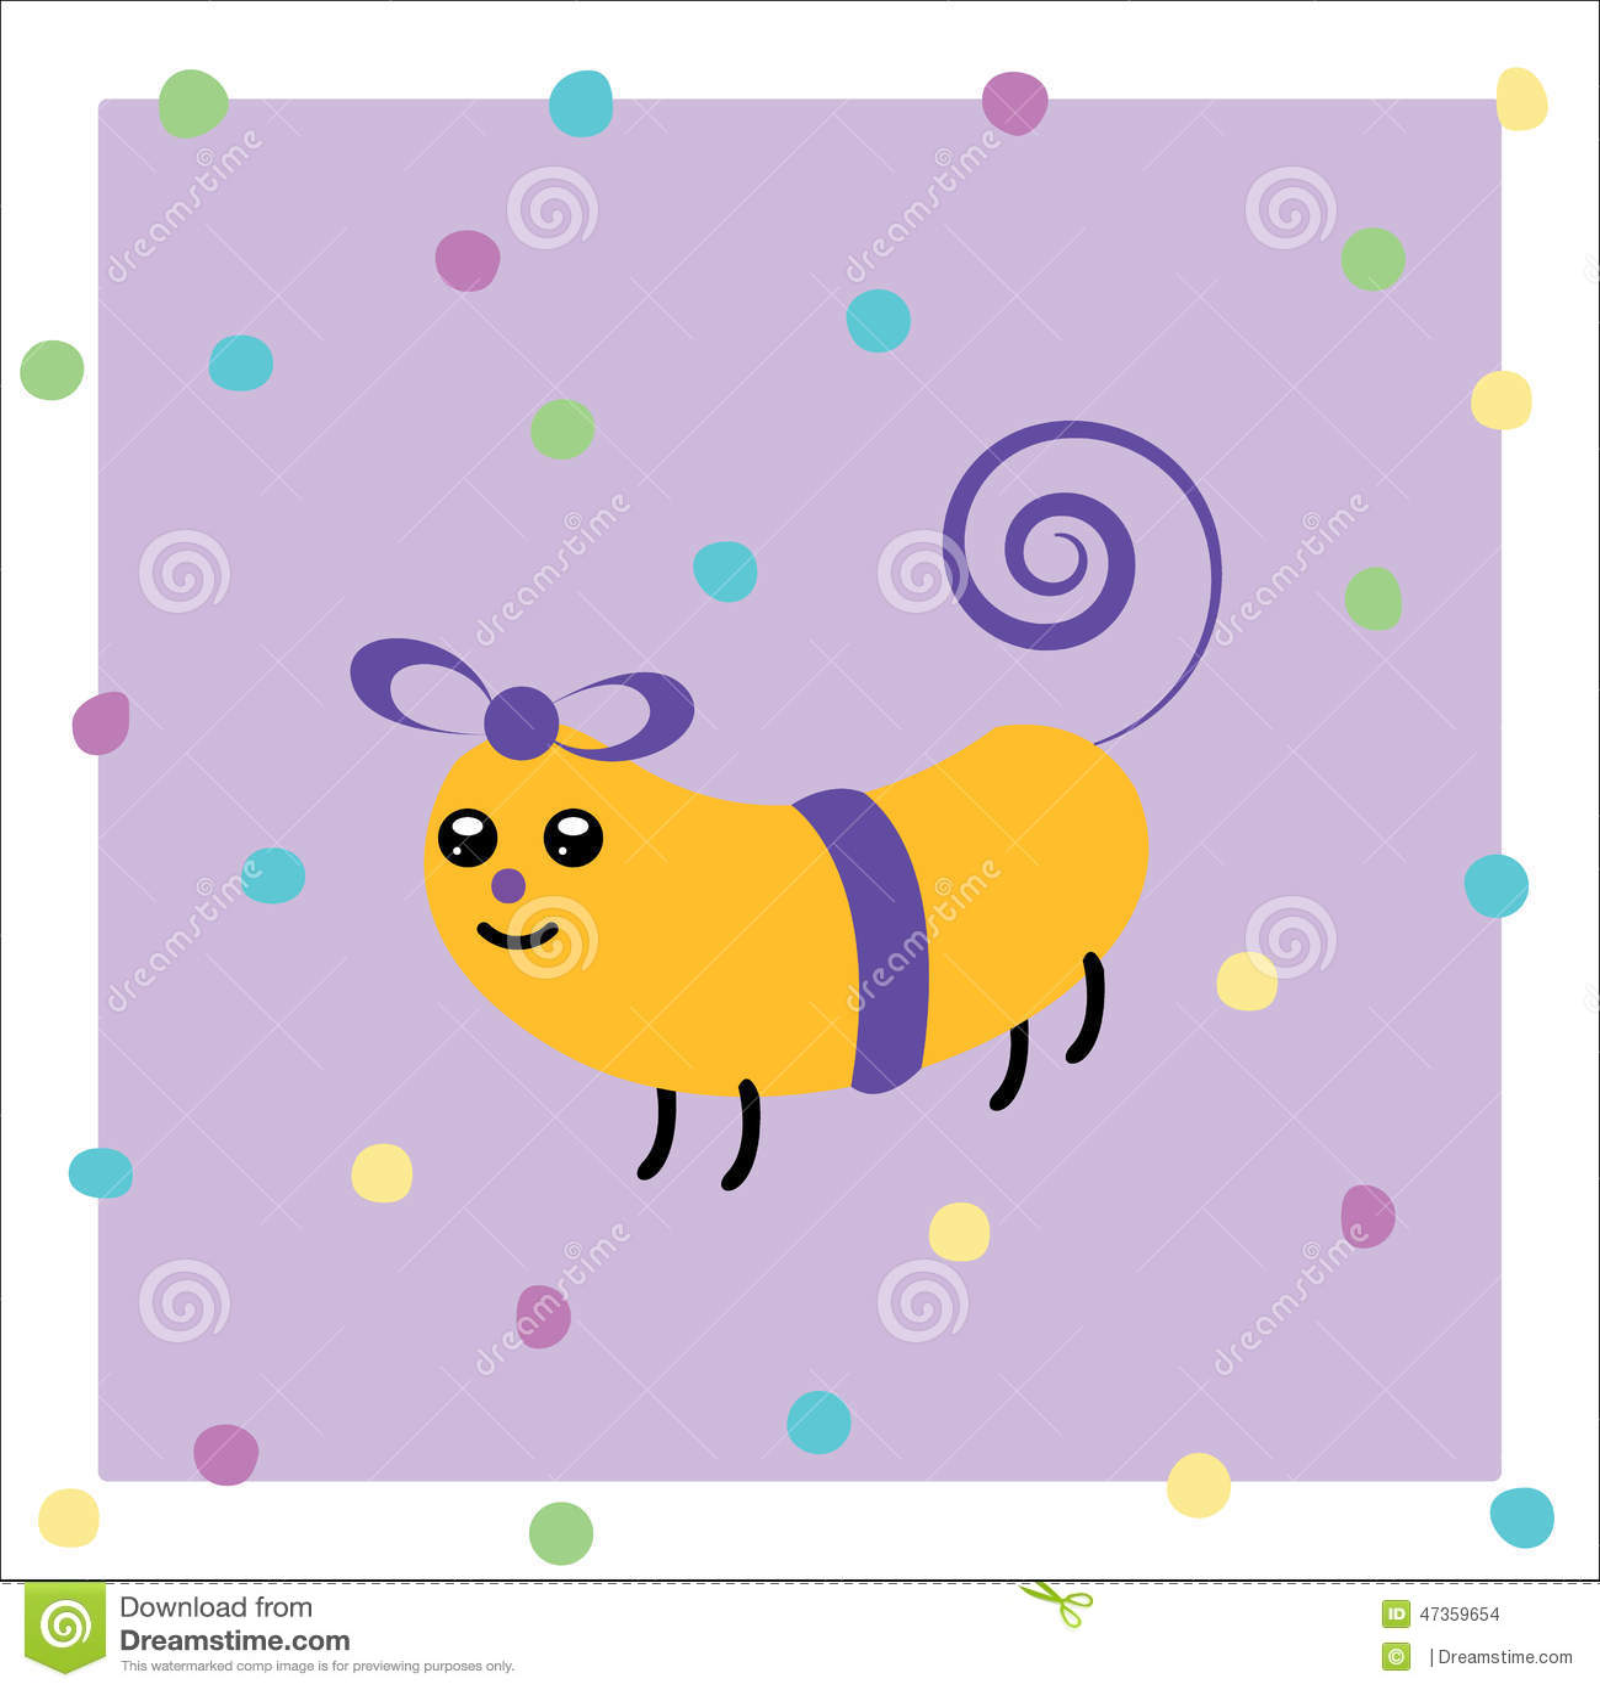 Cartoon Animated Gift Stock Vector Illustration Of Newsletter 47359654